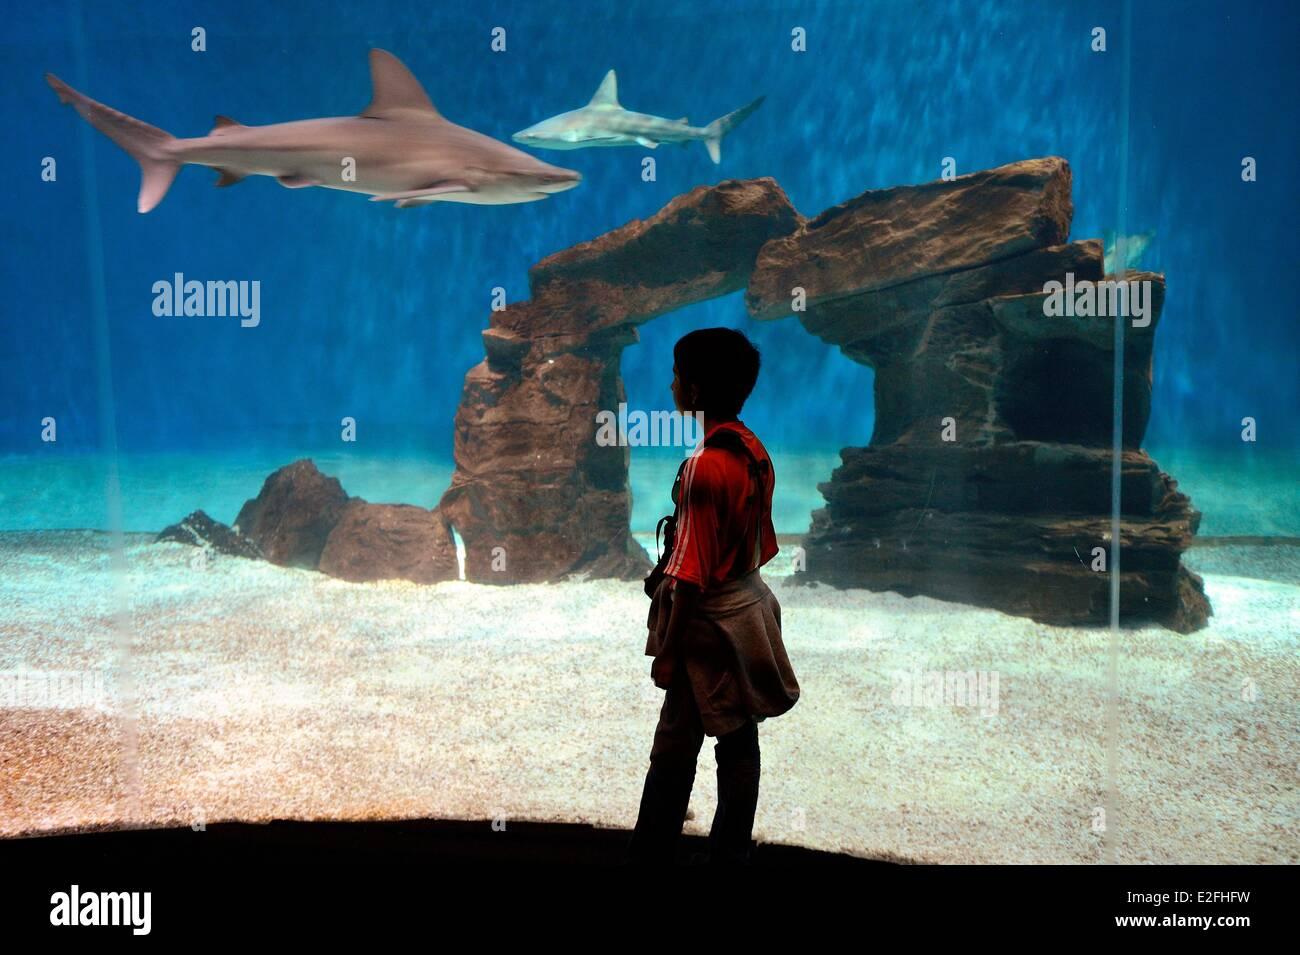 Italy, Liguria, Genoa, Porto Antico, the Aquarium of Genoa is the largest aquarium in Italy and among the largest - Stock Image